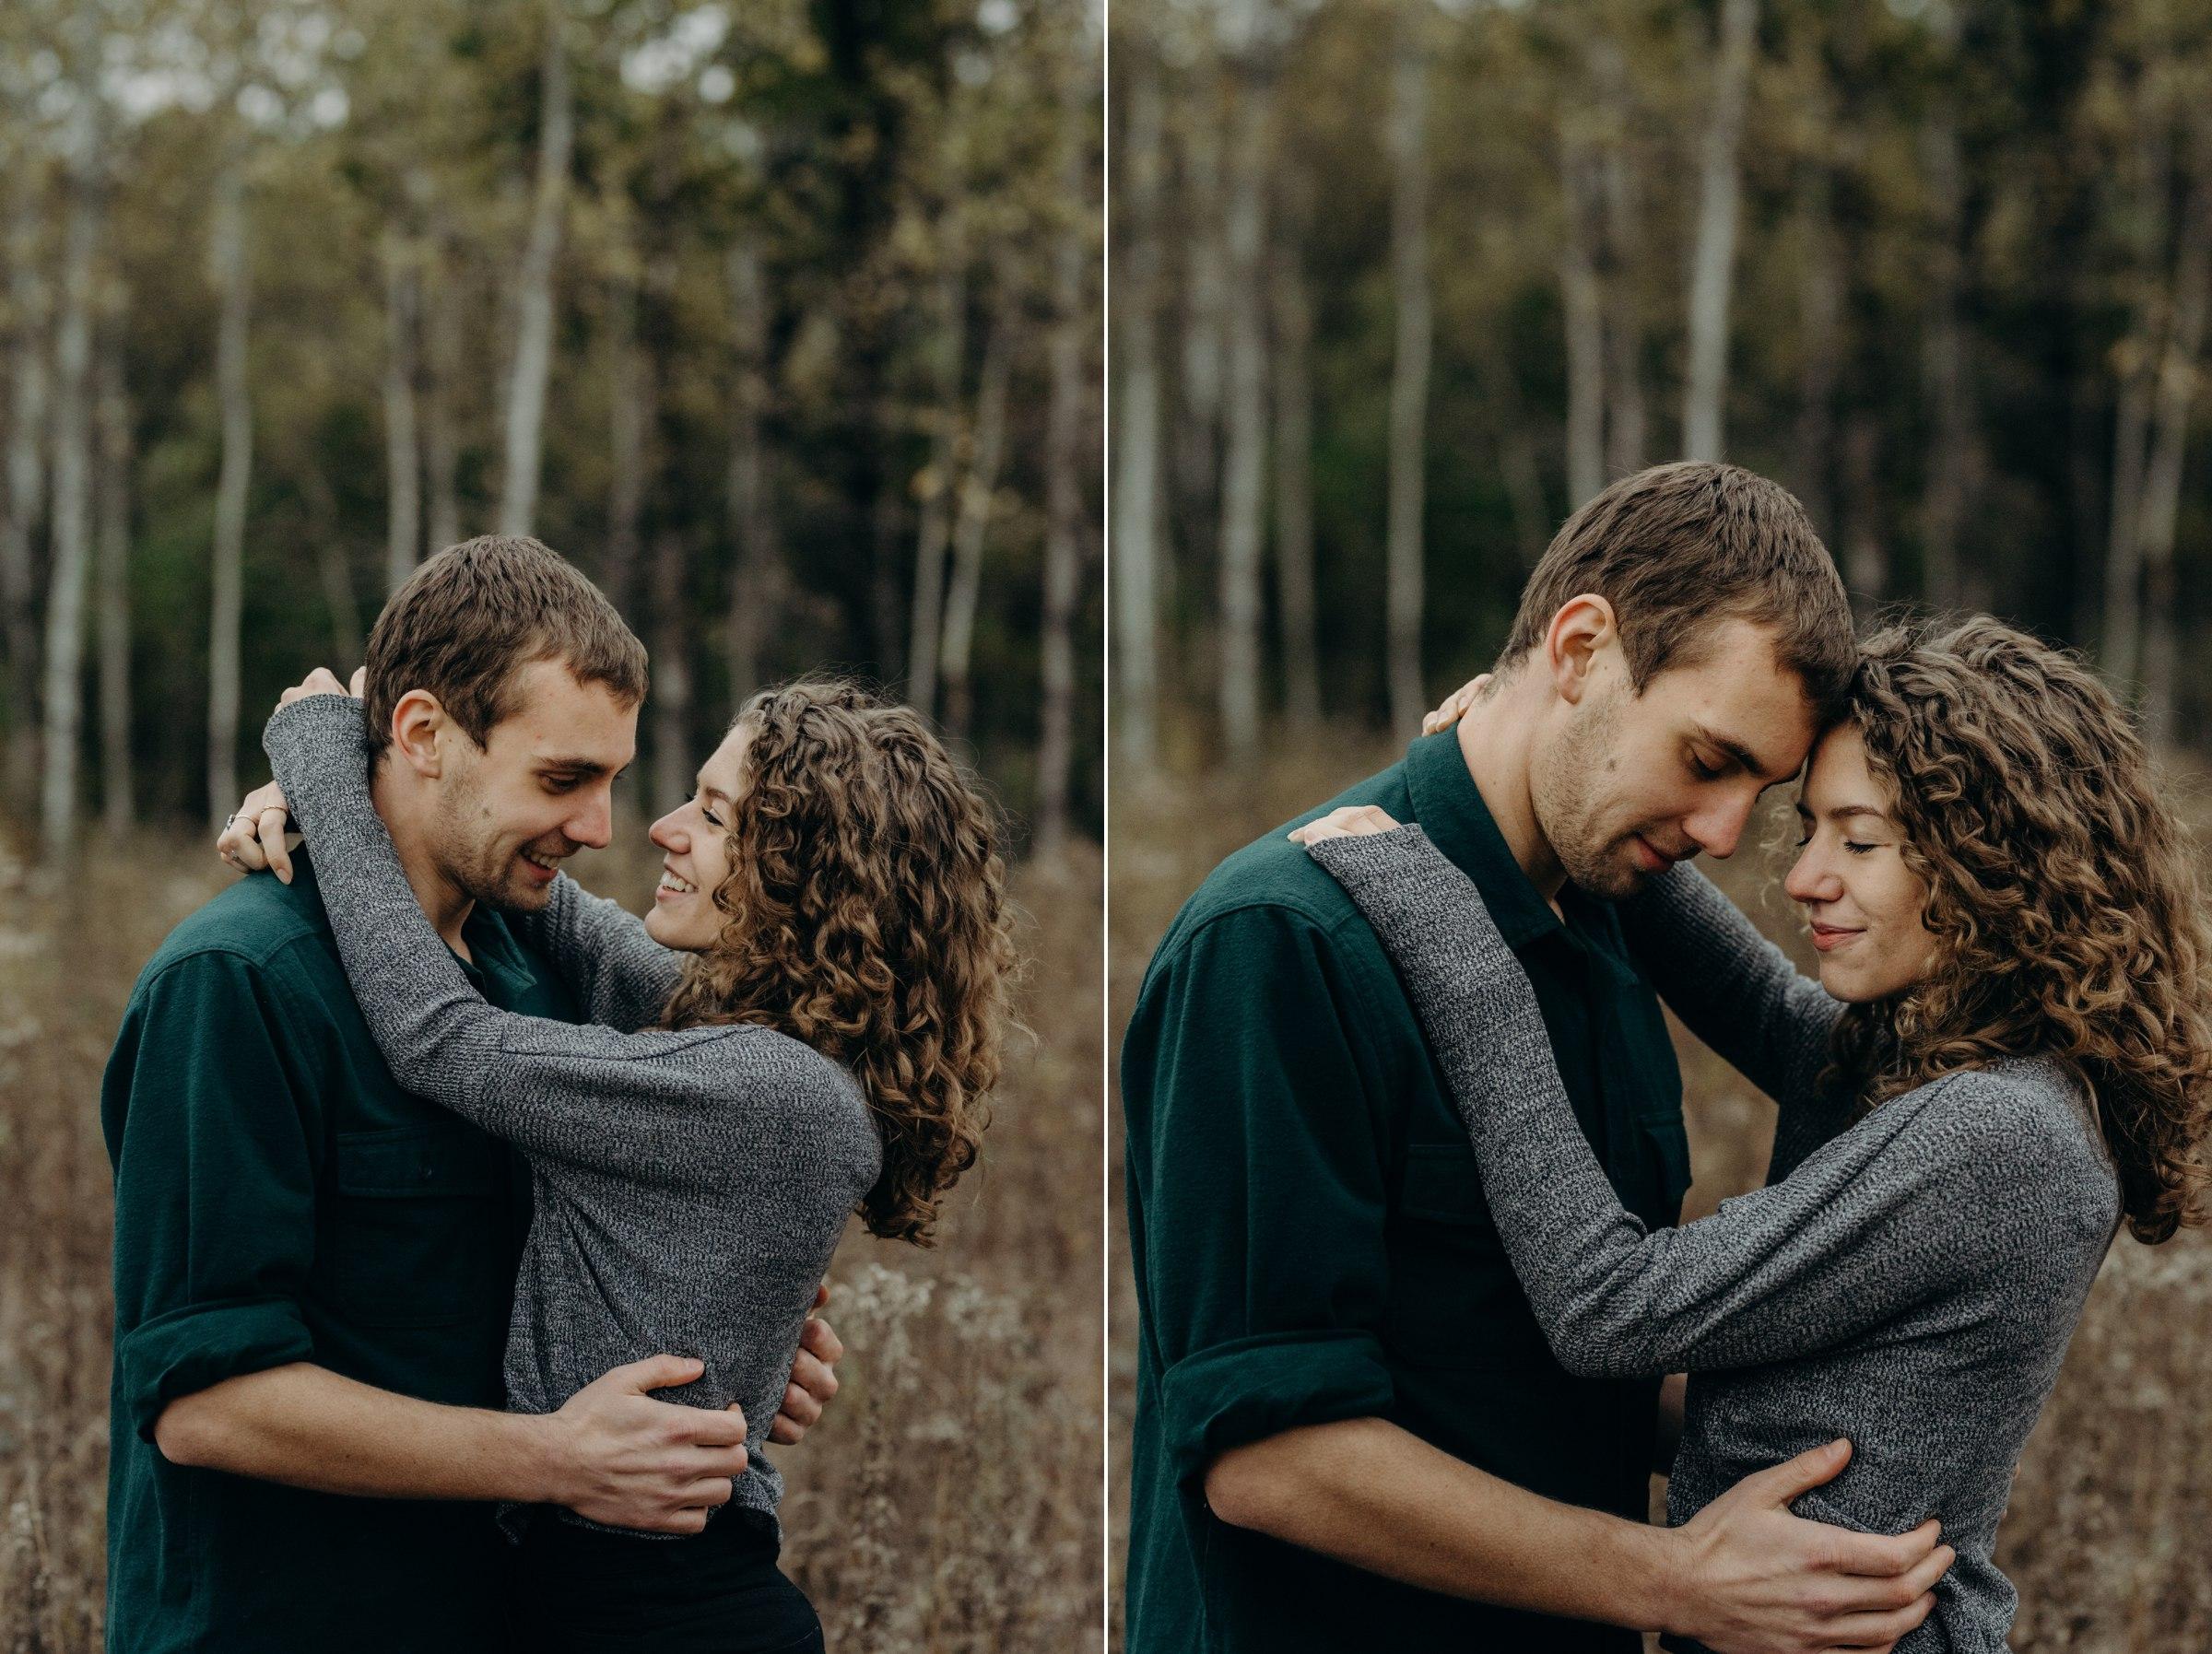 nickmezaphotography-austin-minneapolis-wedding-photographer-elopement-best-intimate-adventurous-destination-texas-minnesota-engagement-jess-dan-spacesaver_0180.jpg